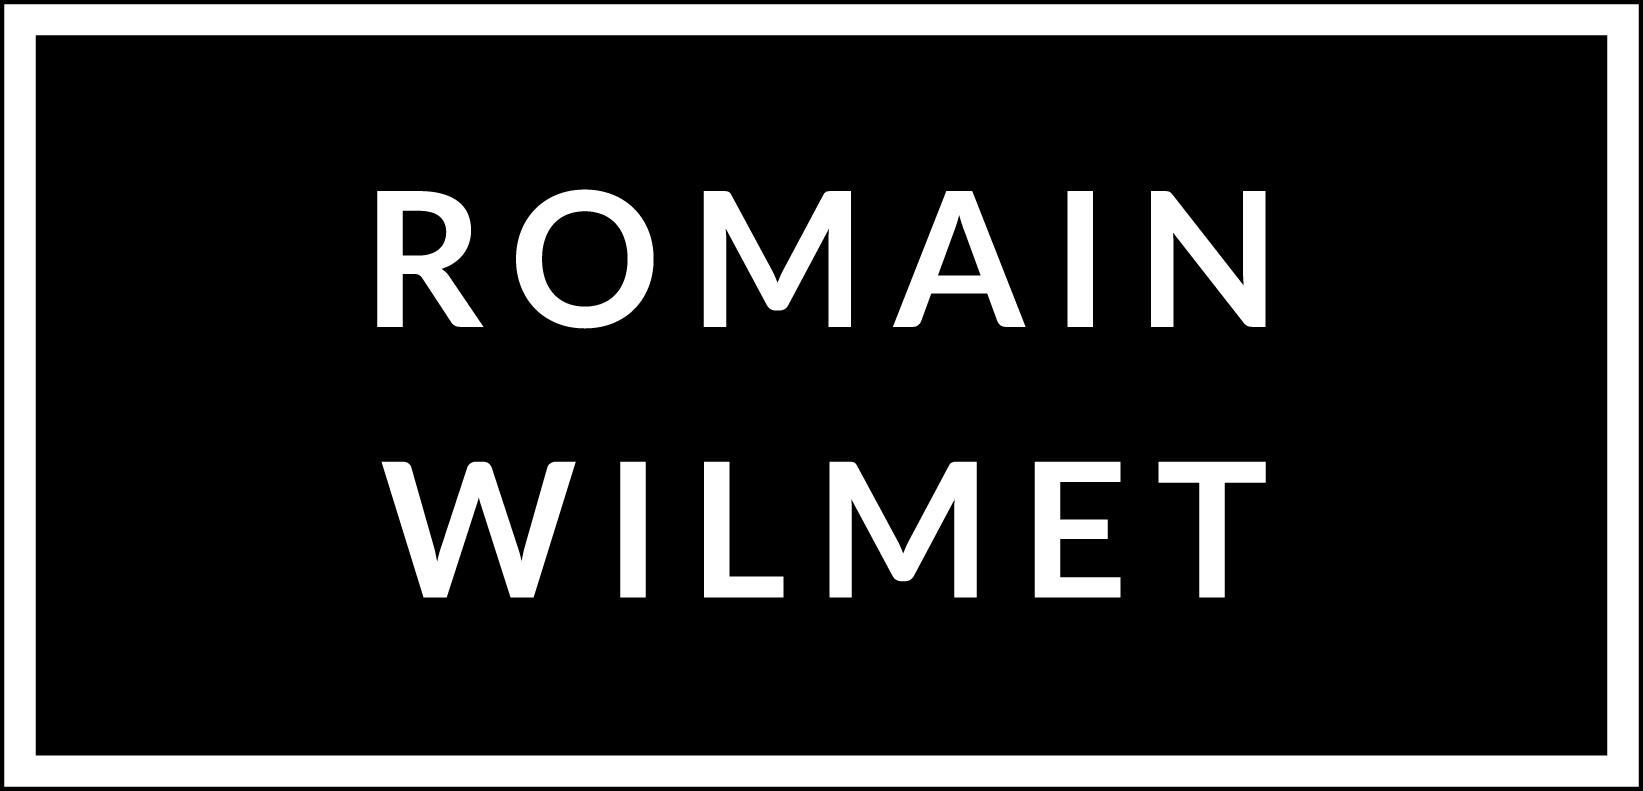 RomainWilmet.com